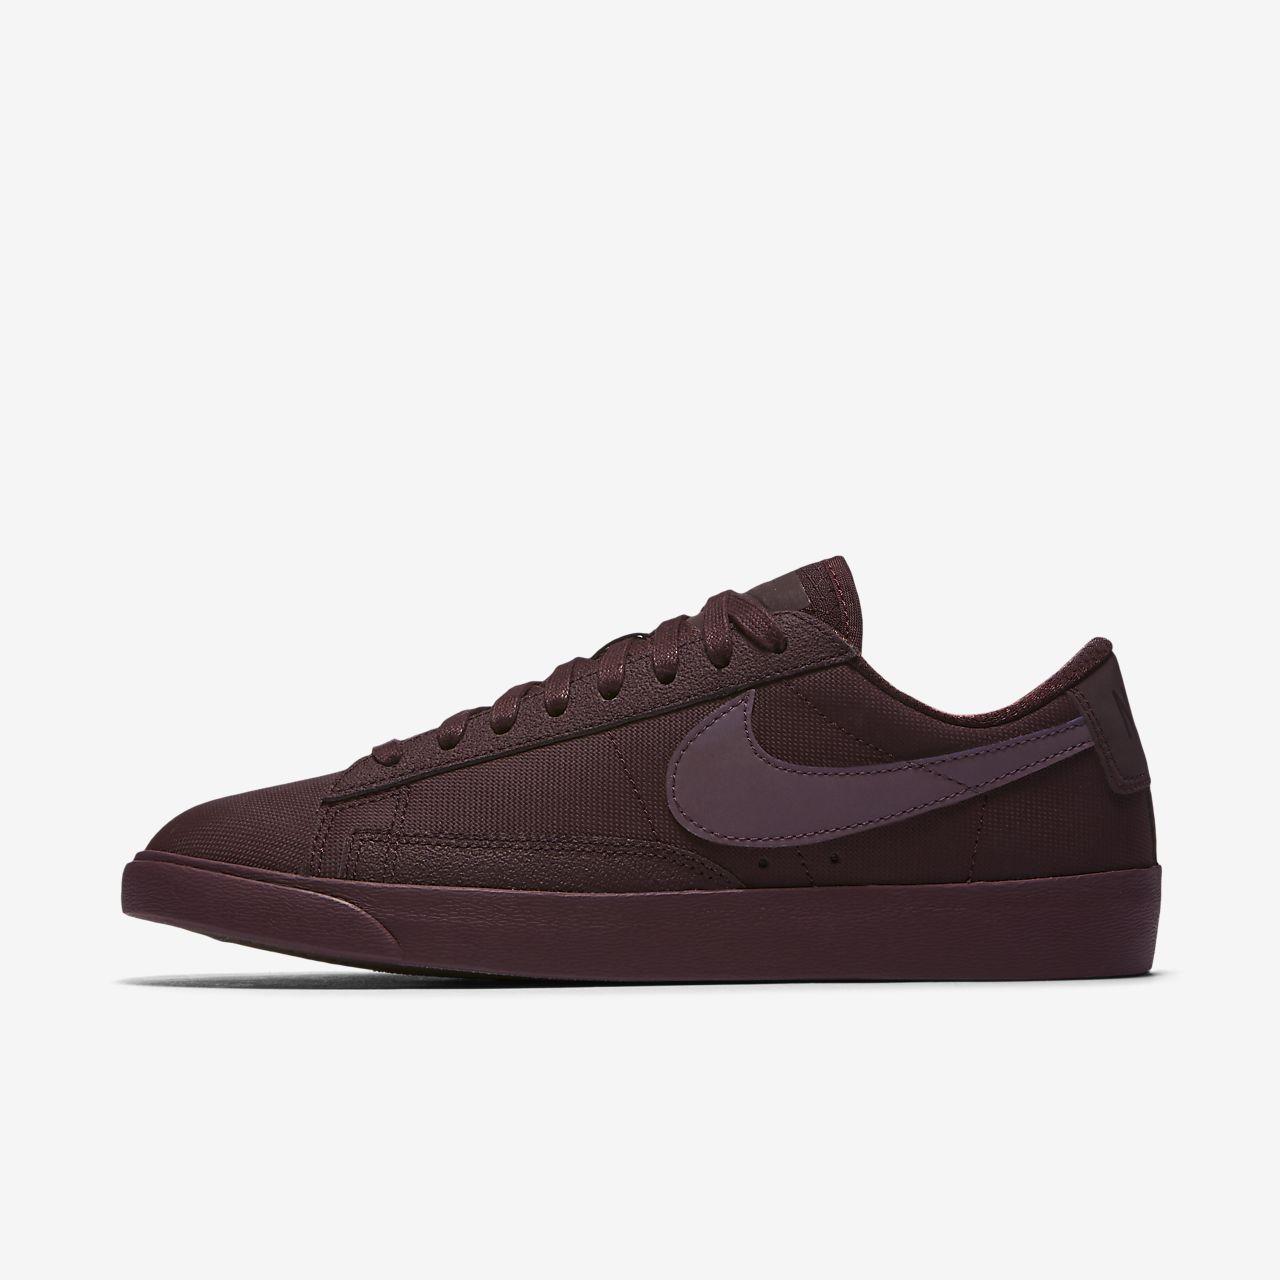 Nike Blazer Low Pinnacle - 4822I